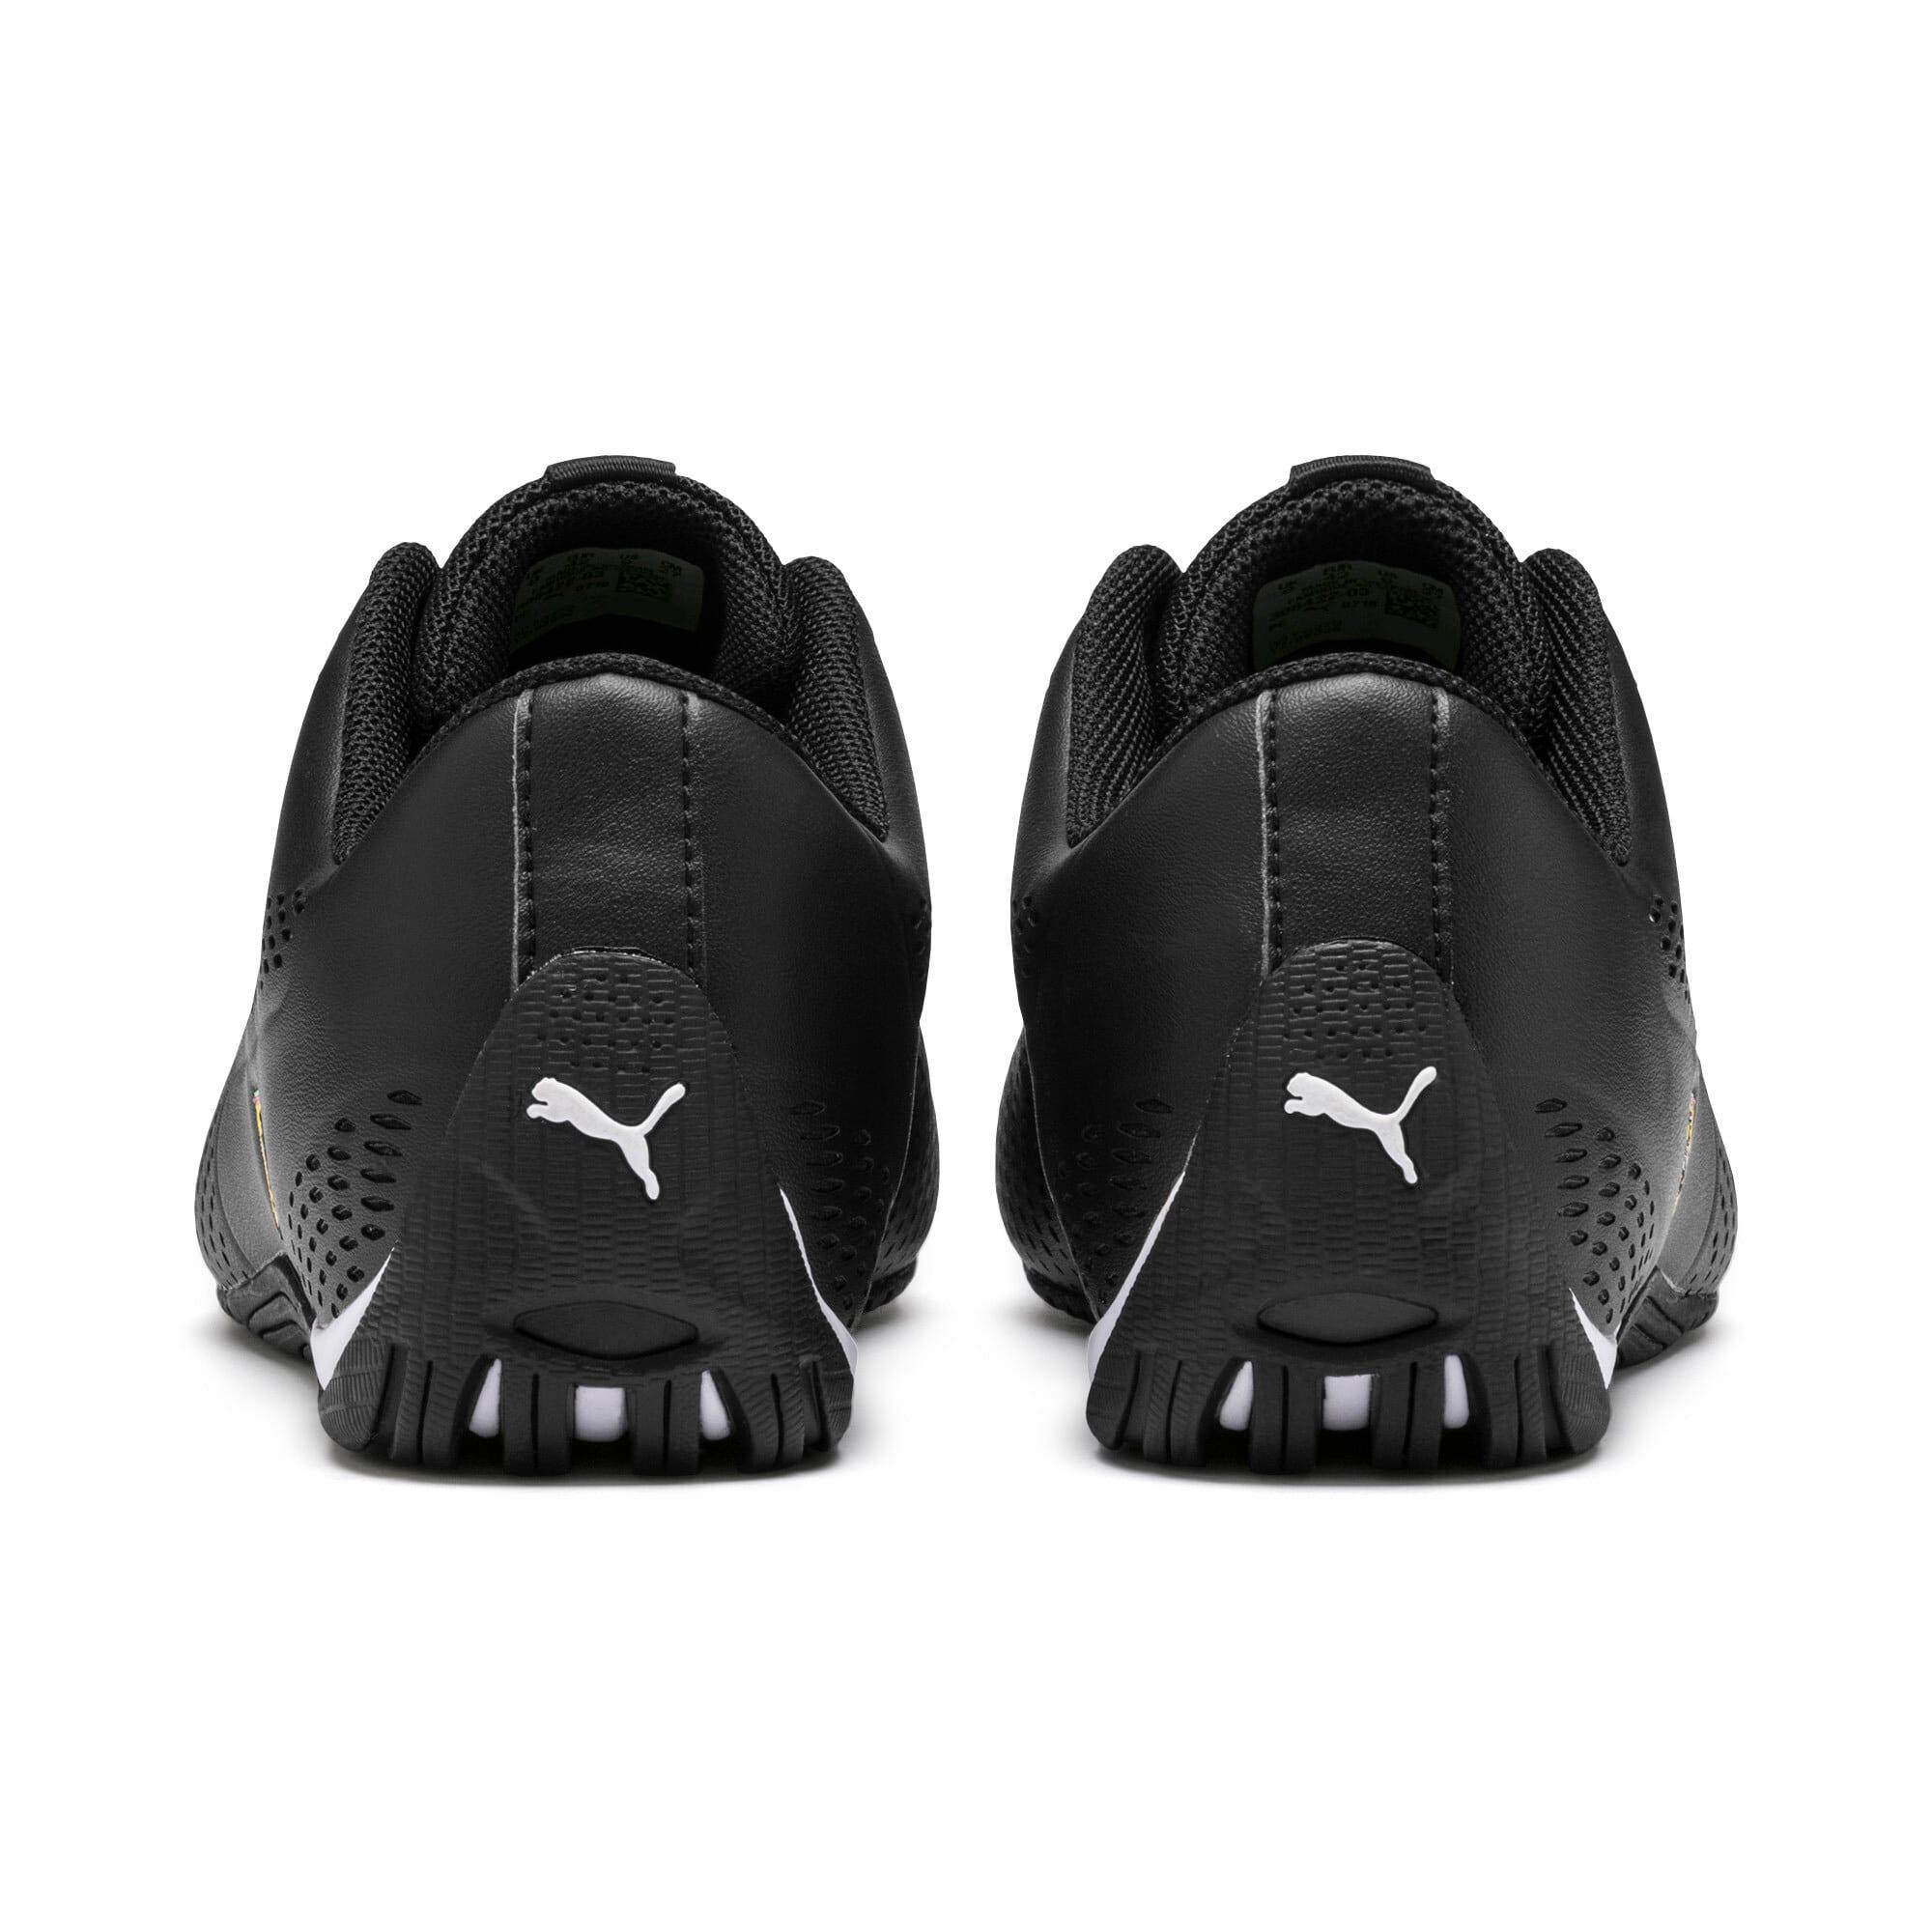 Thumbnail 4 of Scuderia Ferrari Drift Cat 5 Ultra II Men's Shoes, Puma Black-Puma White, medium